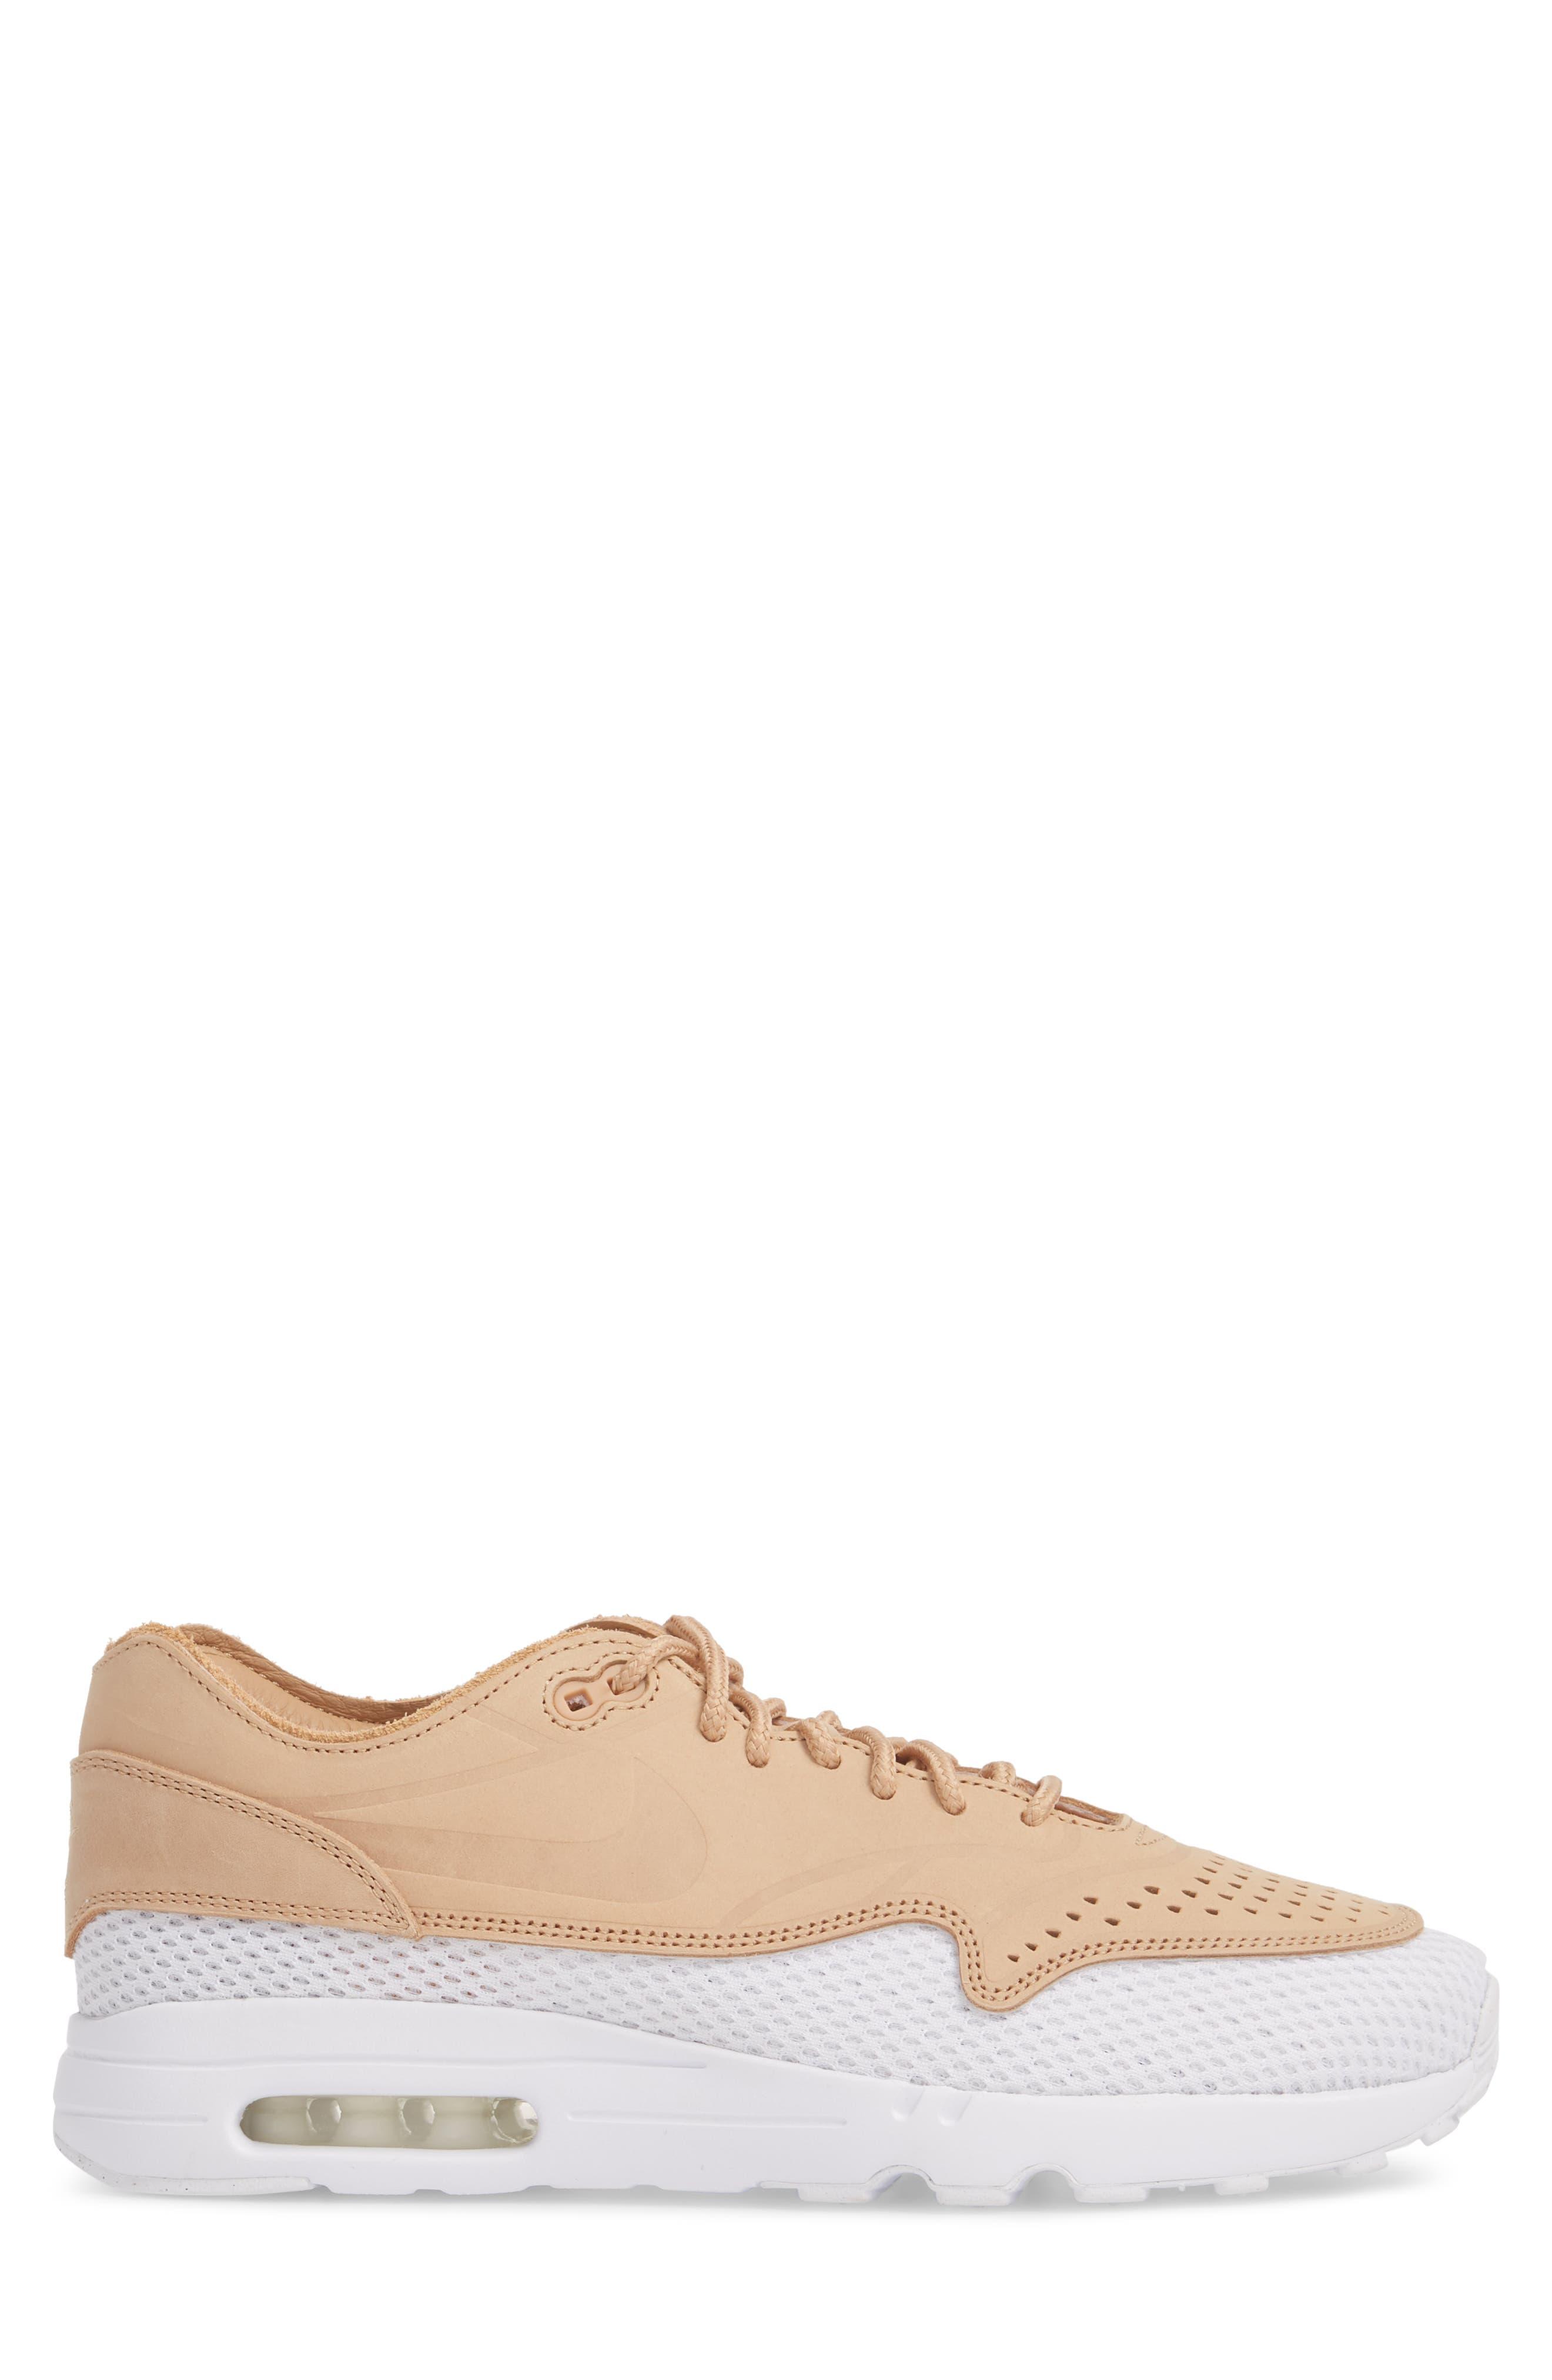 Air Max 1 Ultra 2.0 Premium Sneaker,                             Alternate thumbnail 3, color,                             VACHETTA TAN/ WHITE